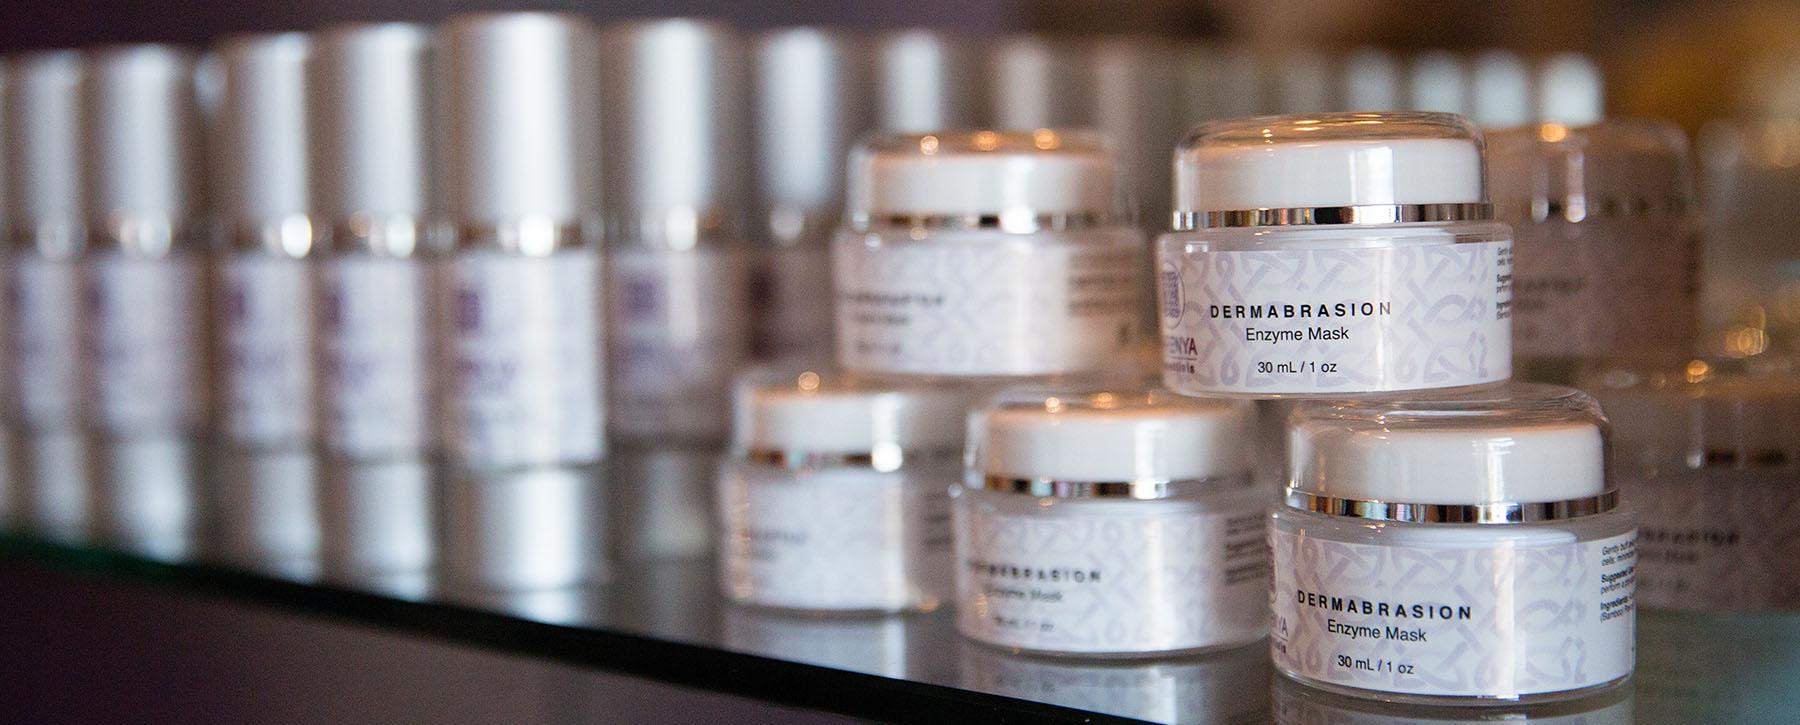 Varenya Essentials Skin Care Line